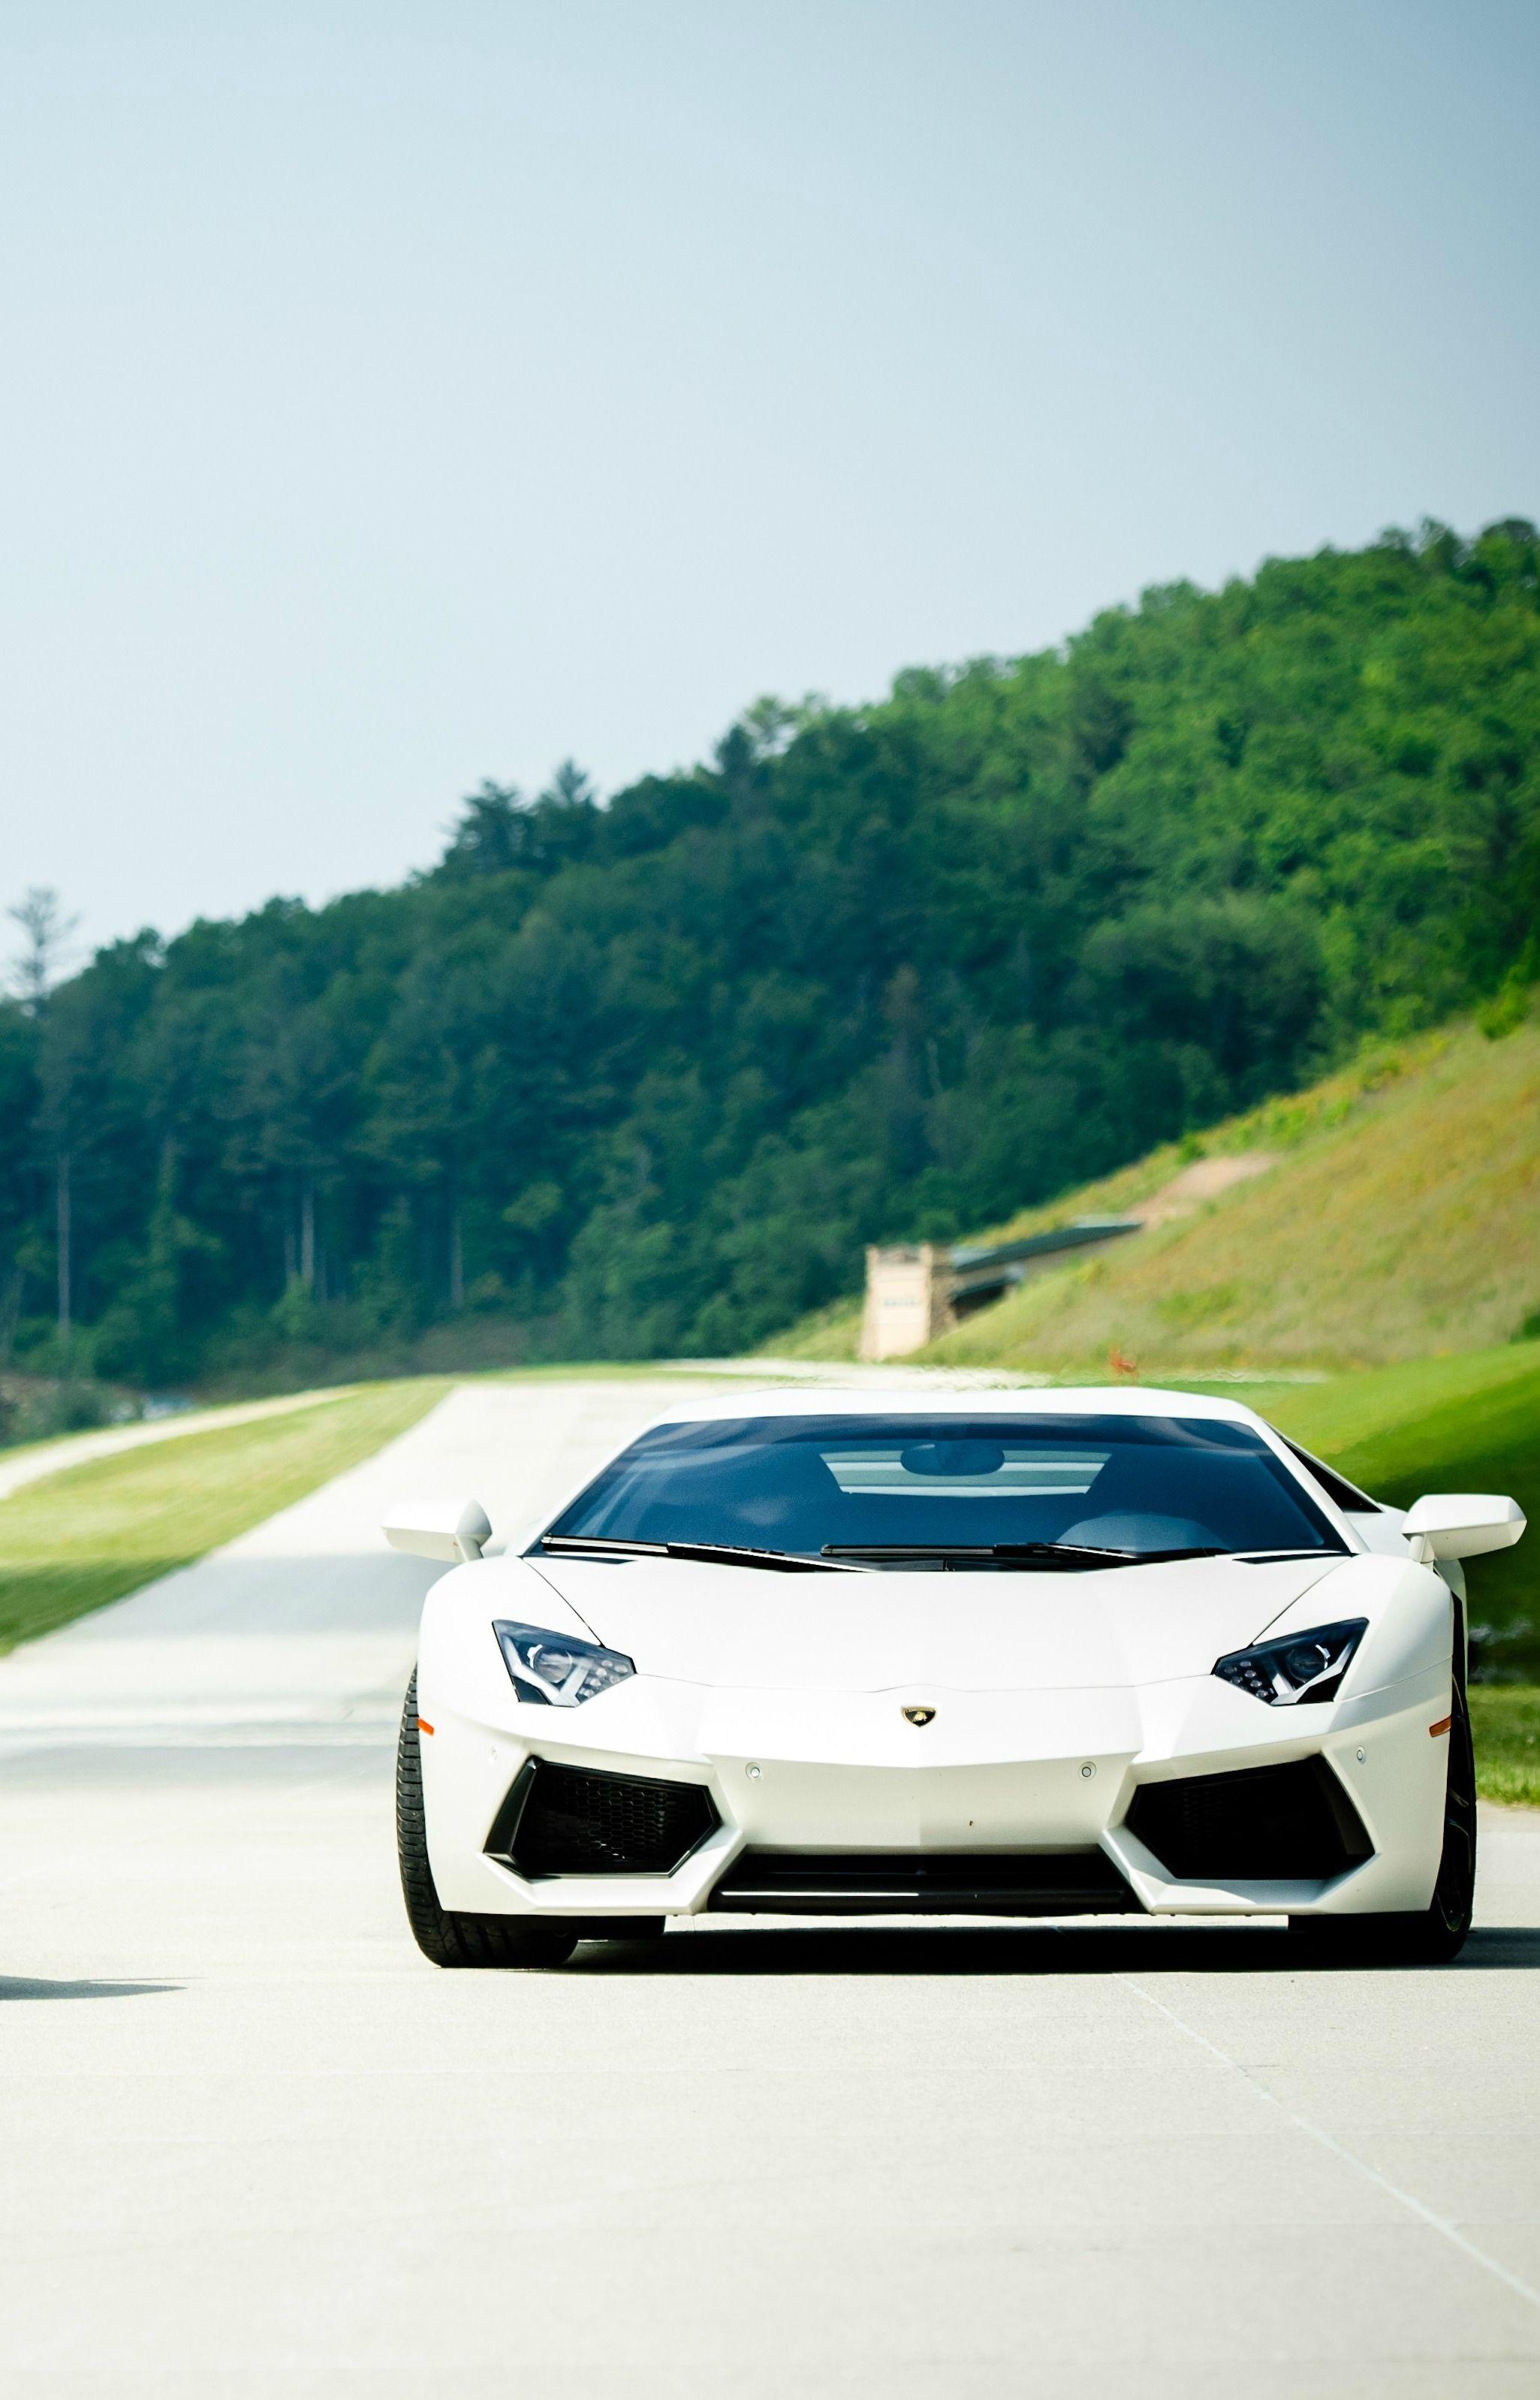 Lambo Forthecars In 2020 Super Luxury Cars Lamborghini Sports Cars Luxury